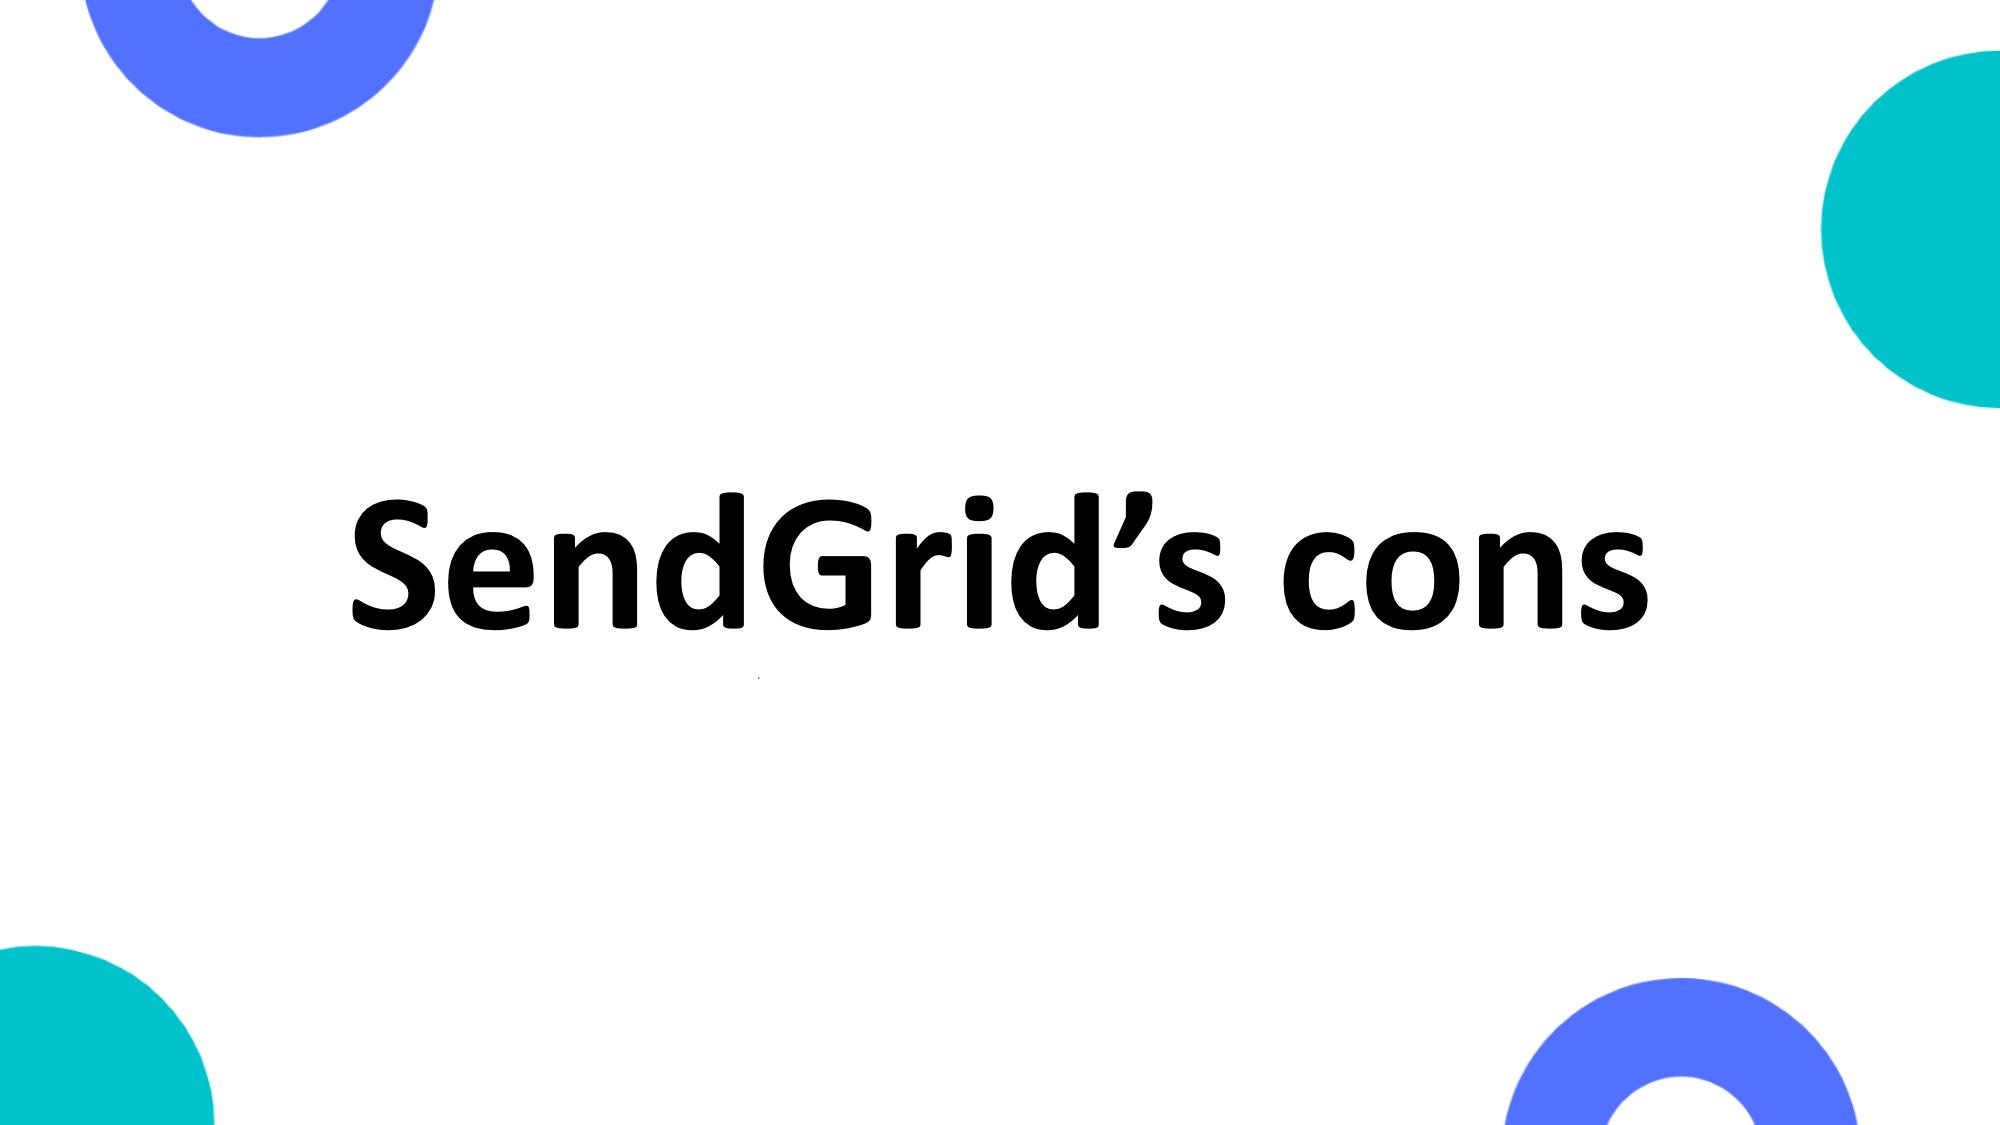 SendGrid's cons